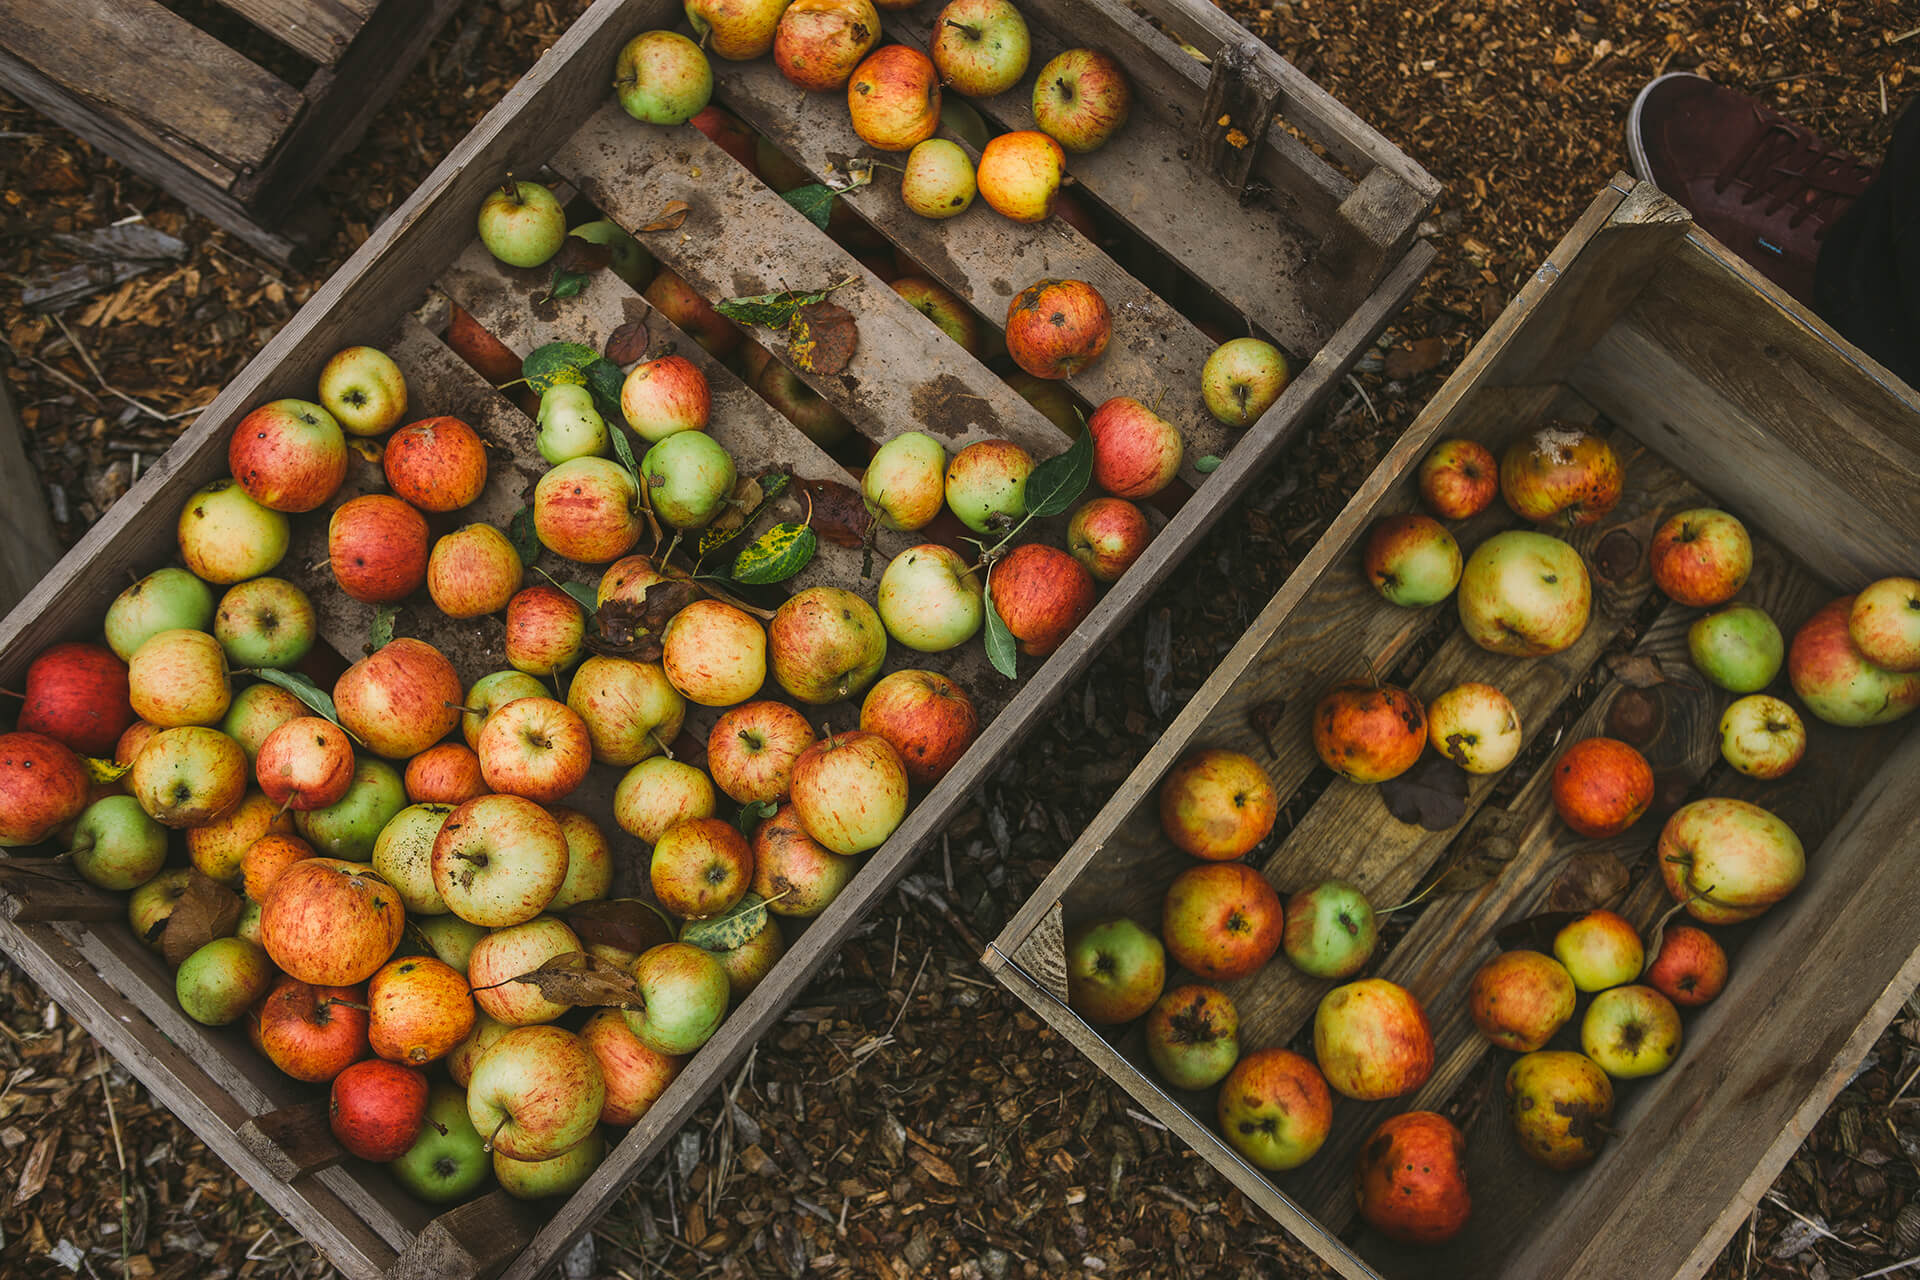 Daylesford, Daylesford Organic, Organic, Farm, Field, Green, Apples, Cider, Crate, Shoe, Grass, Landscape, Vegetables, Summer, Photography, Agency, Marketing, Gloucestershire, WeAreShuffle